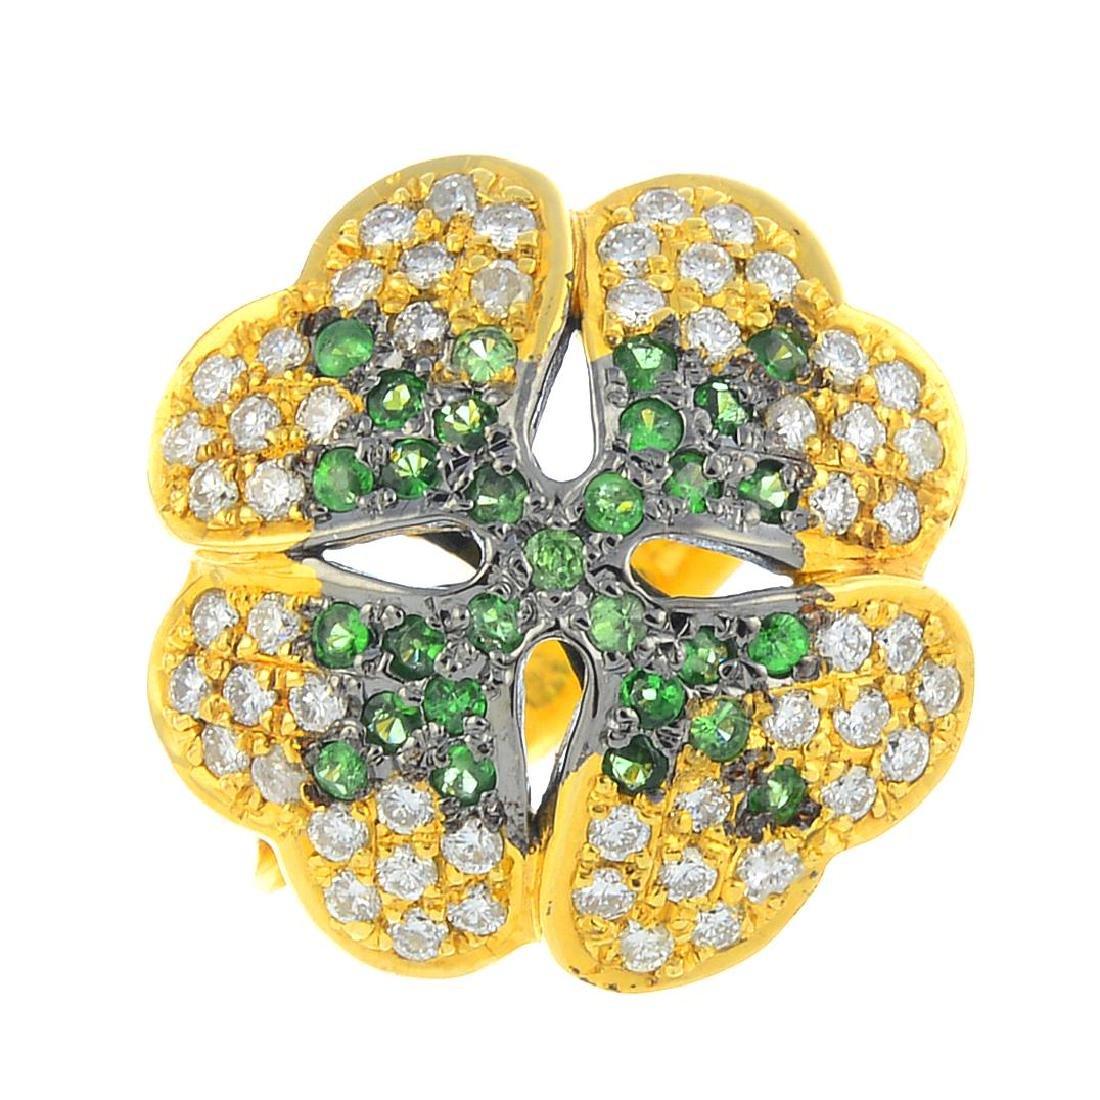 A tsavorite garnet and diamond clover ring. Of